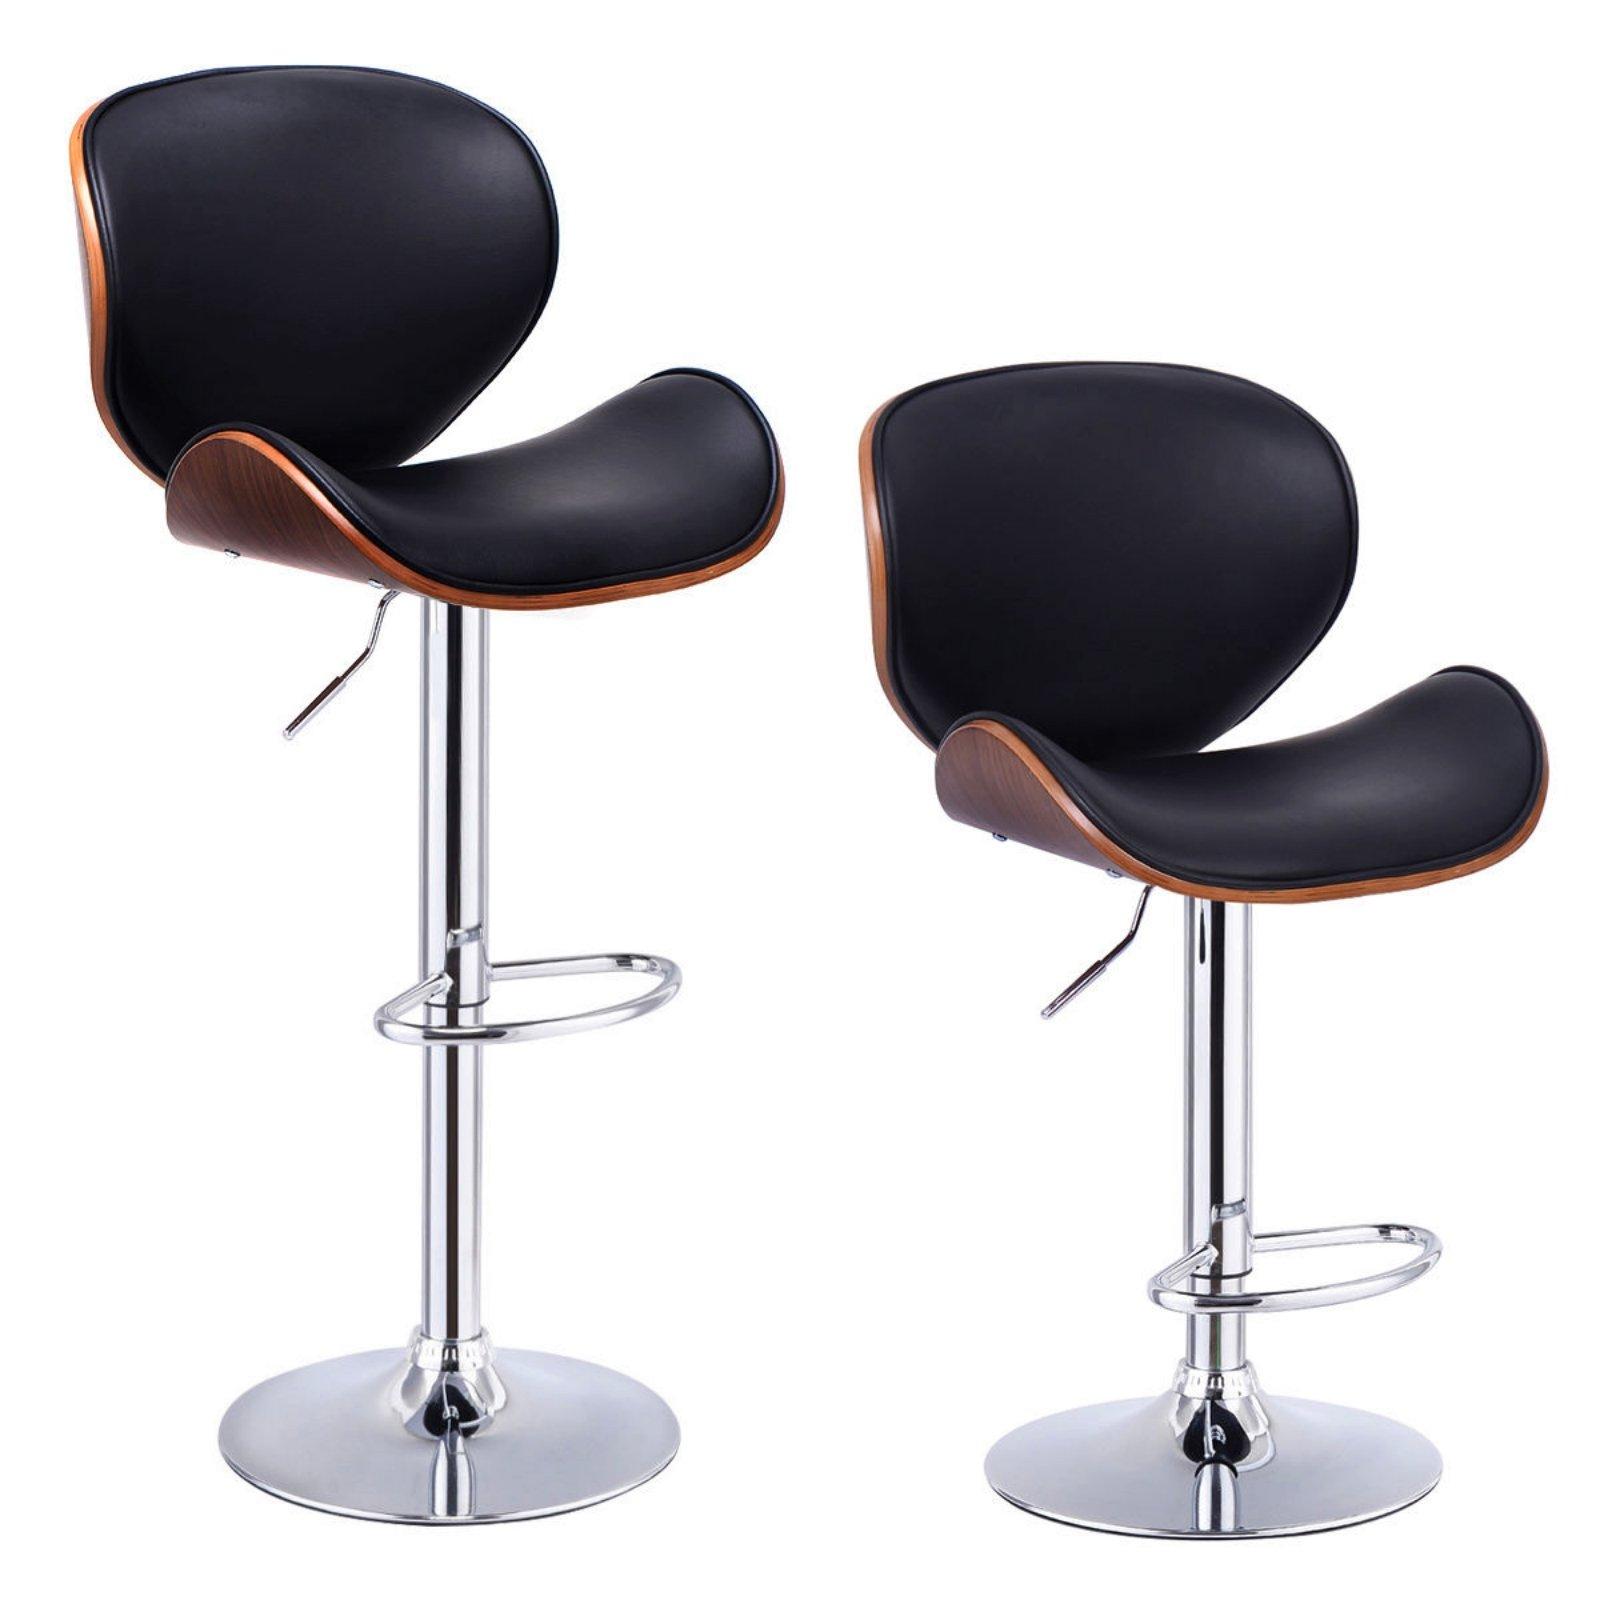 Set of 2 Adjustable Swivel Bentwood Bar Stools Waterproof Anti Aging PU Leather Modern Pub Style Chairs #757